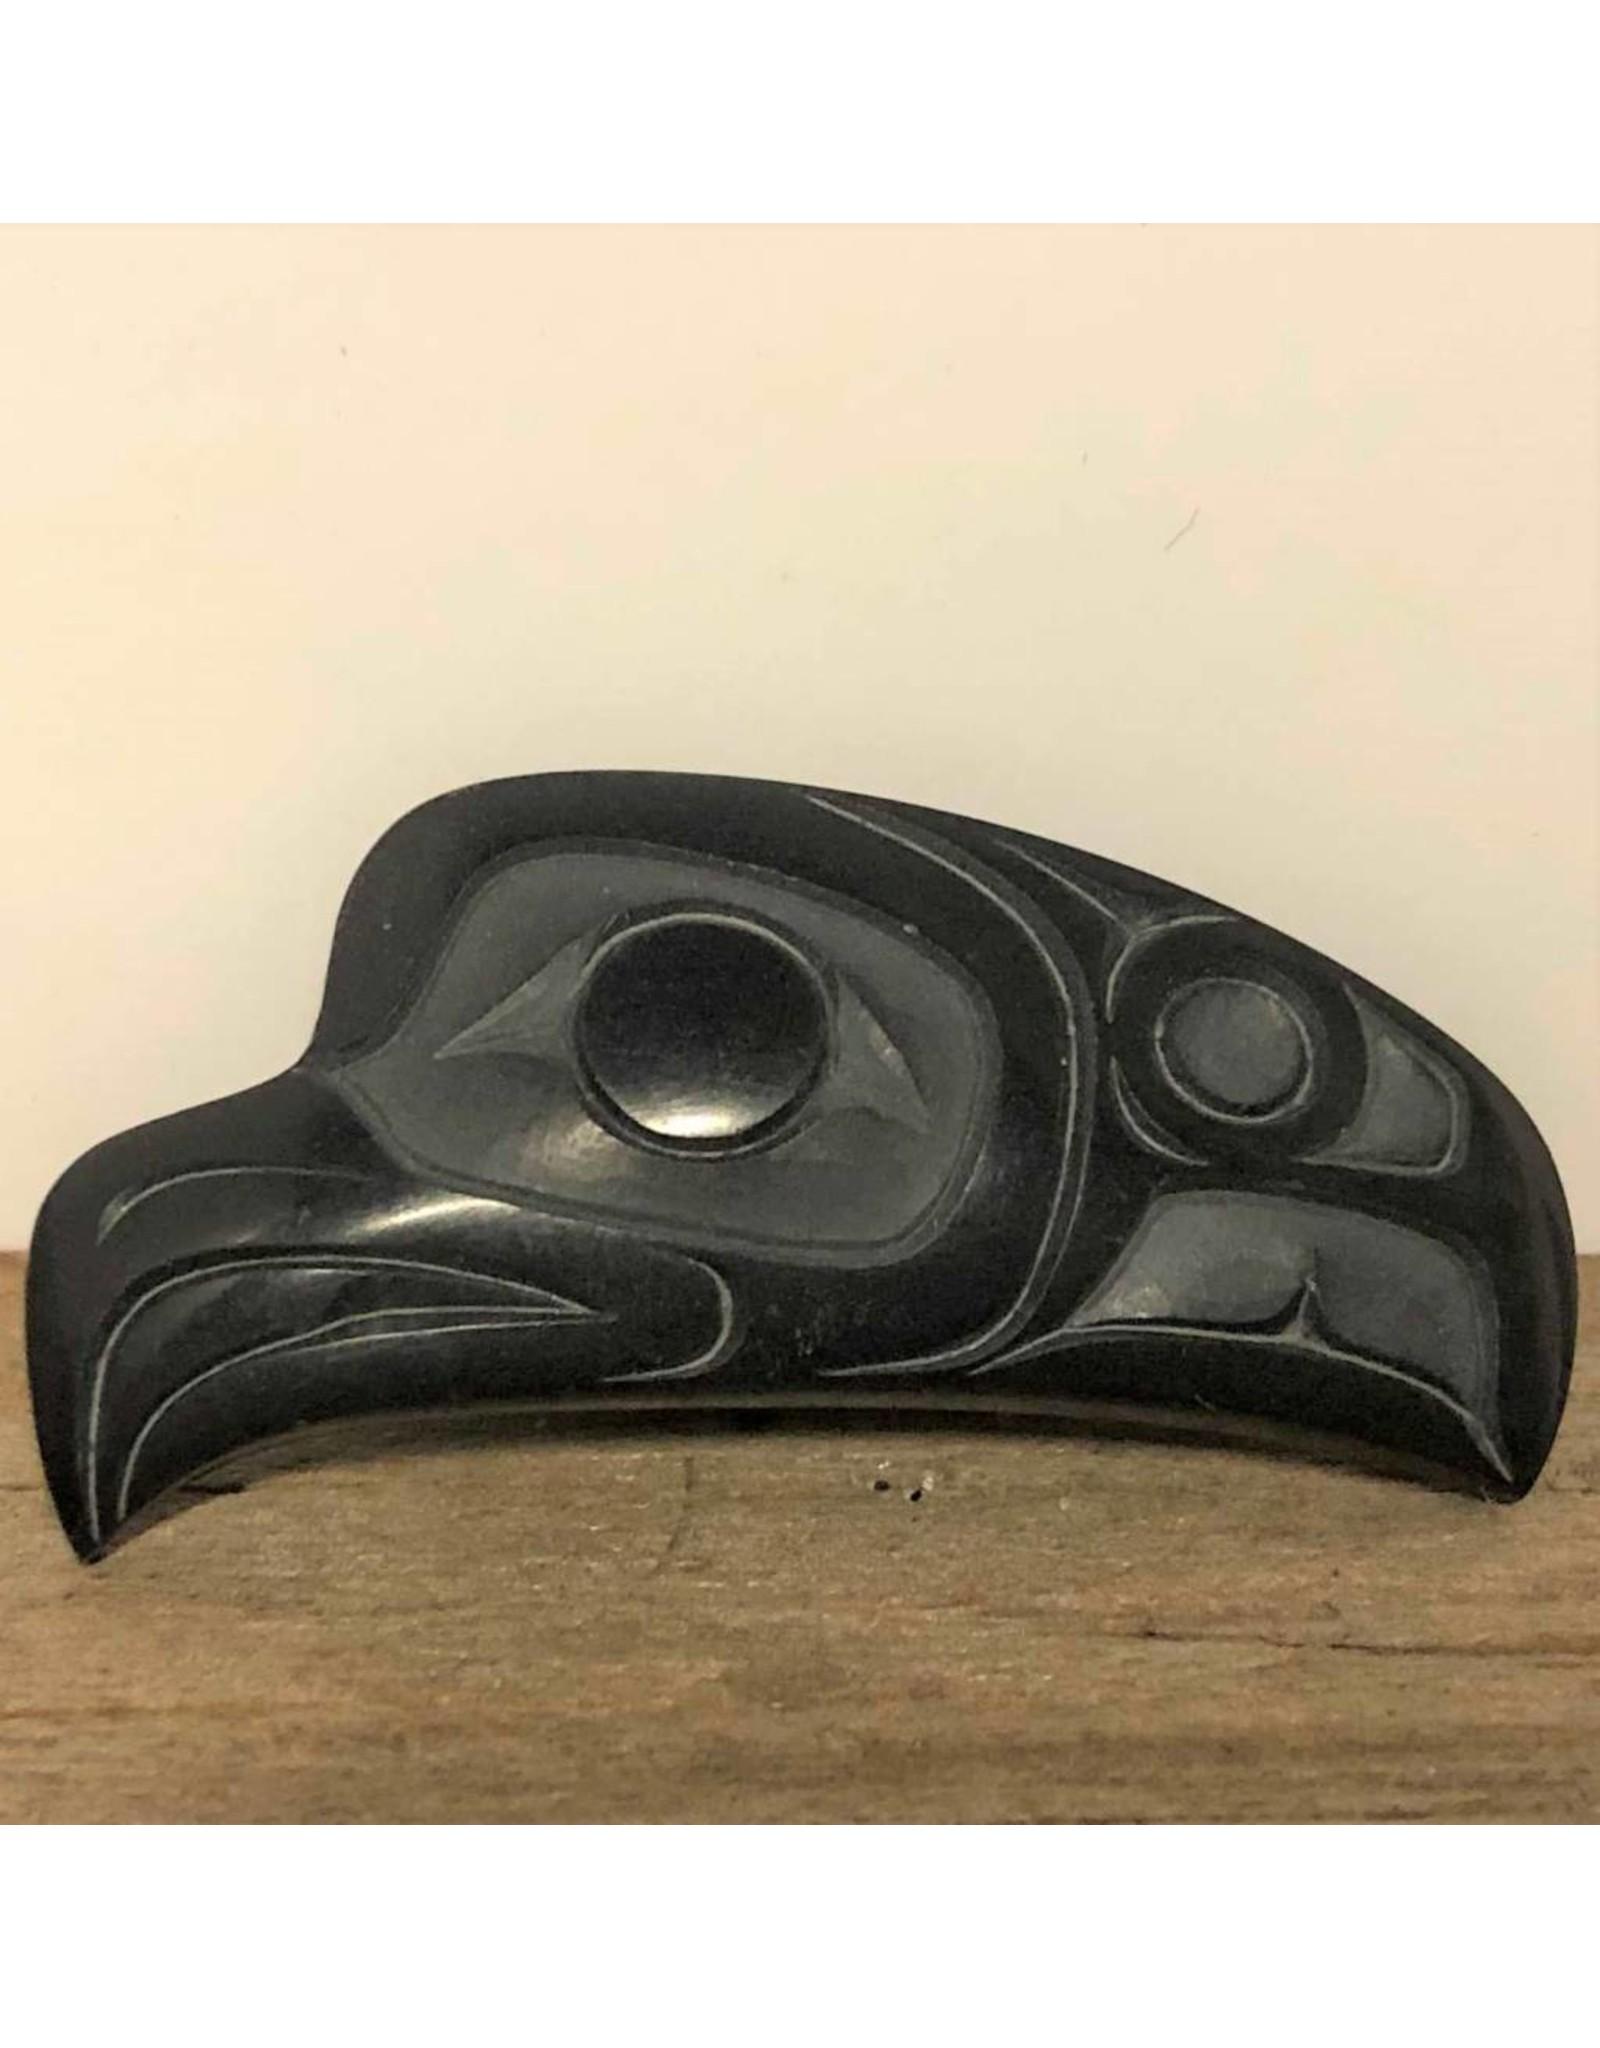 Pin - argillite, eagle, signed possibly HT, Haida Gwaii